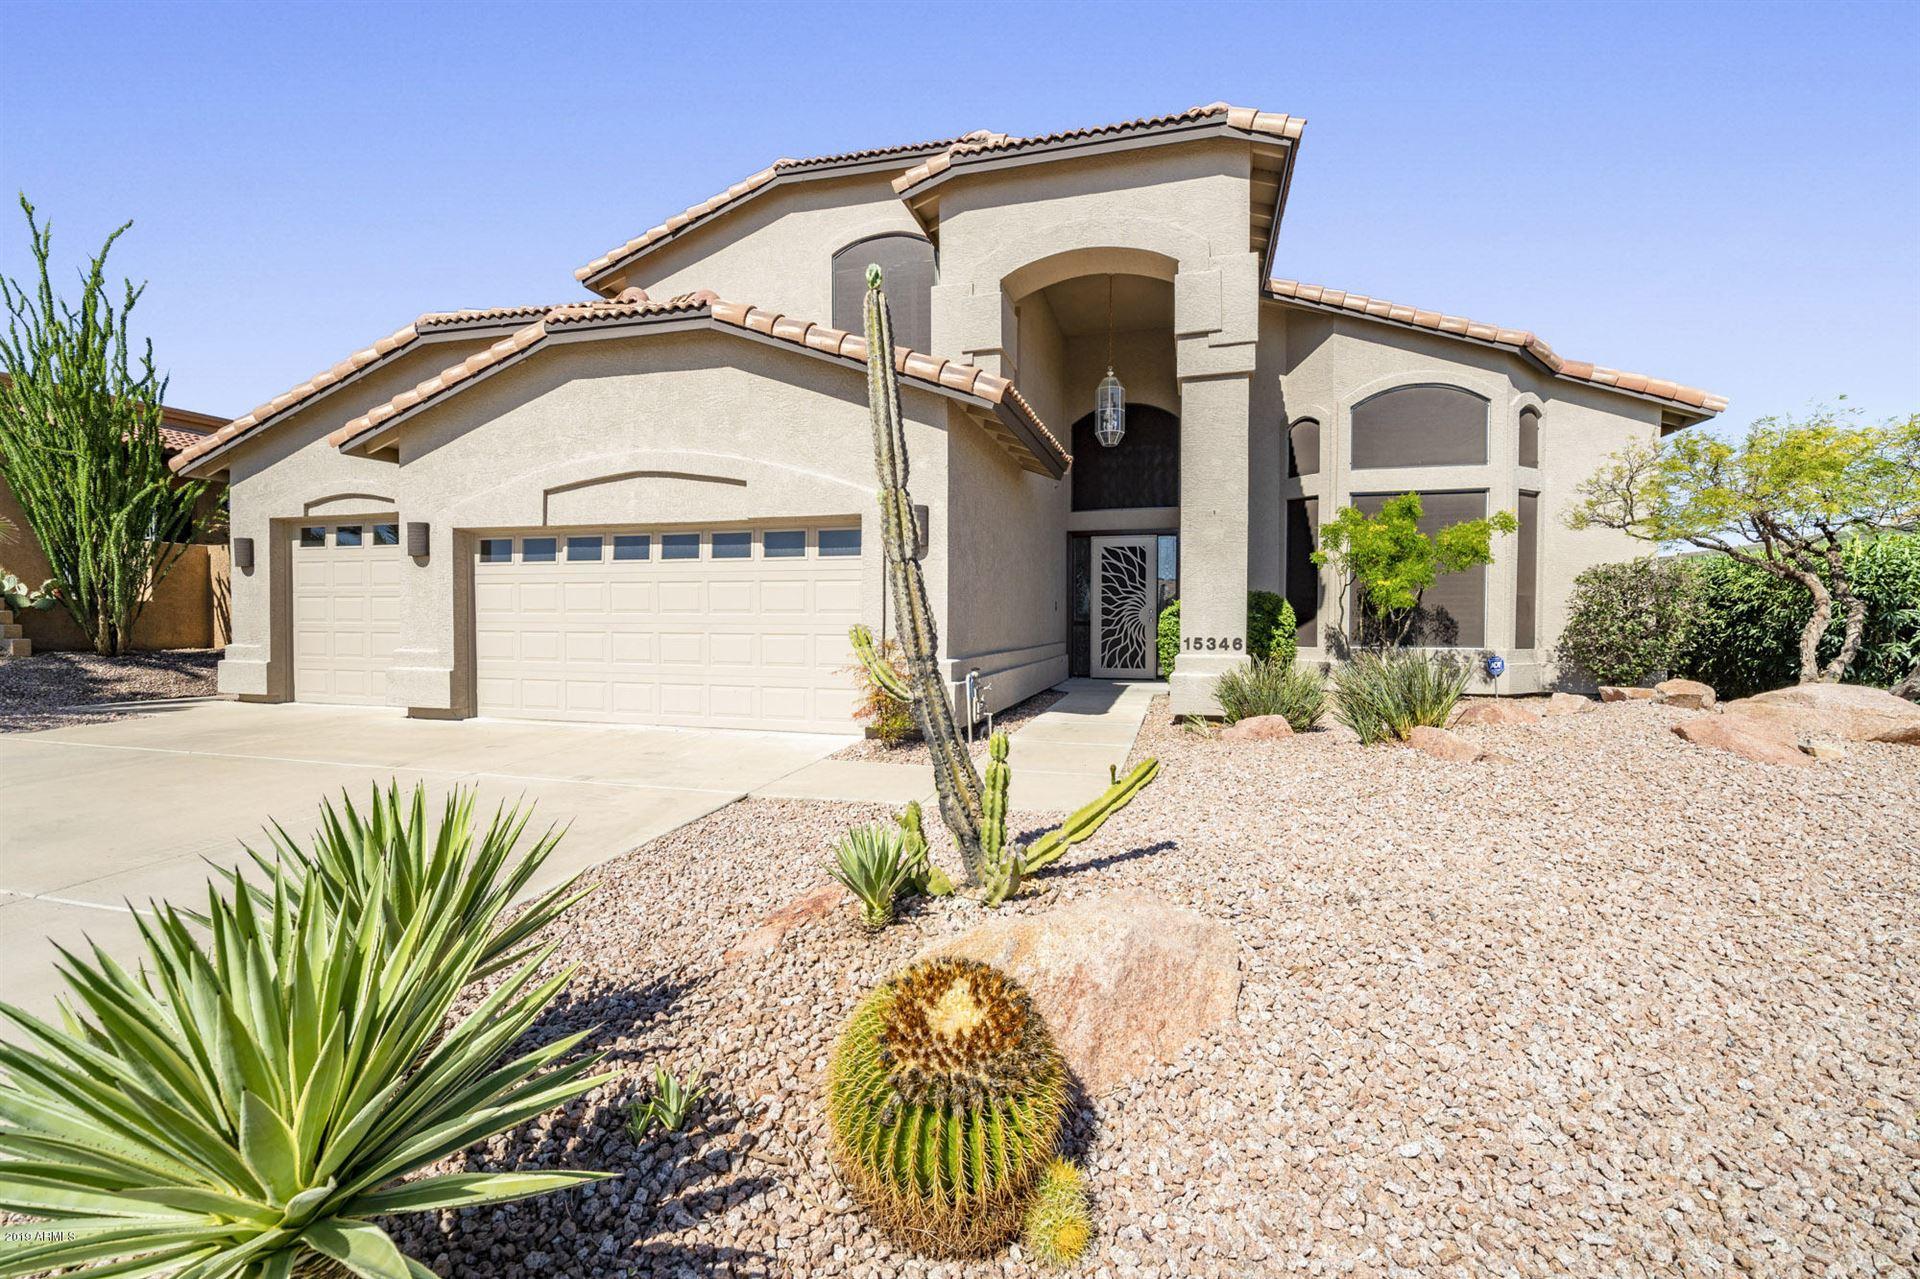 15346 E PALOMINO Boulevard, Fountain Hills, AZ 85268 - MLS#: 5991757